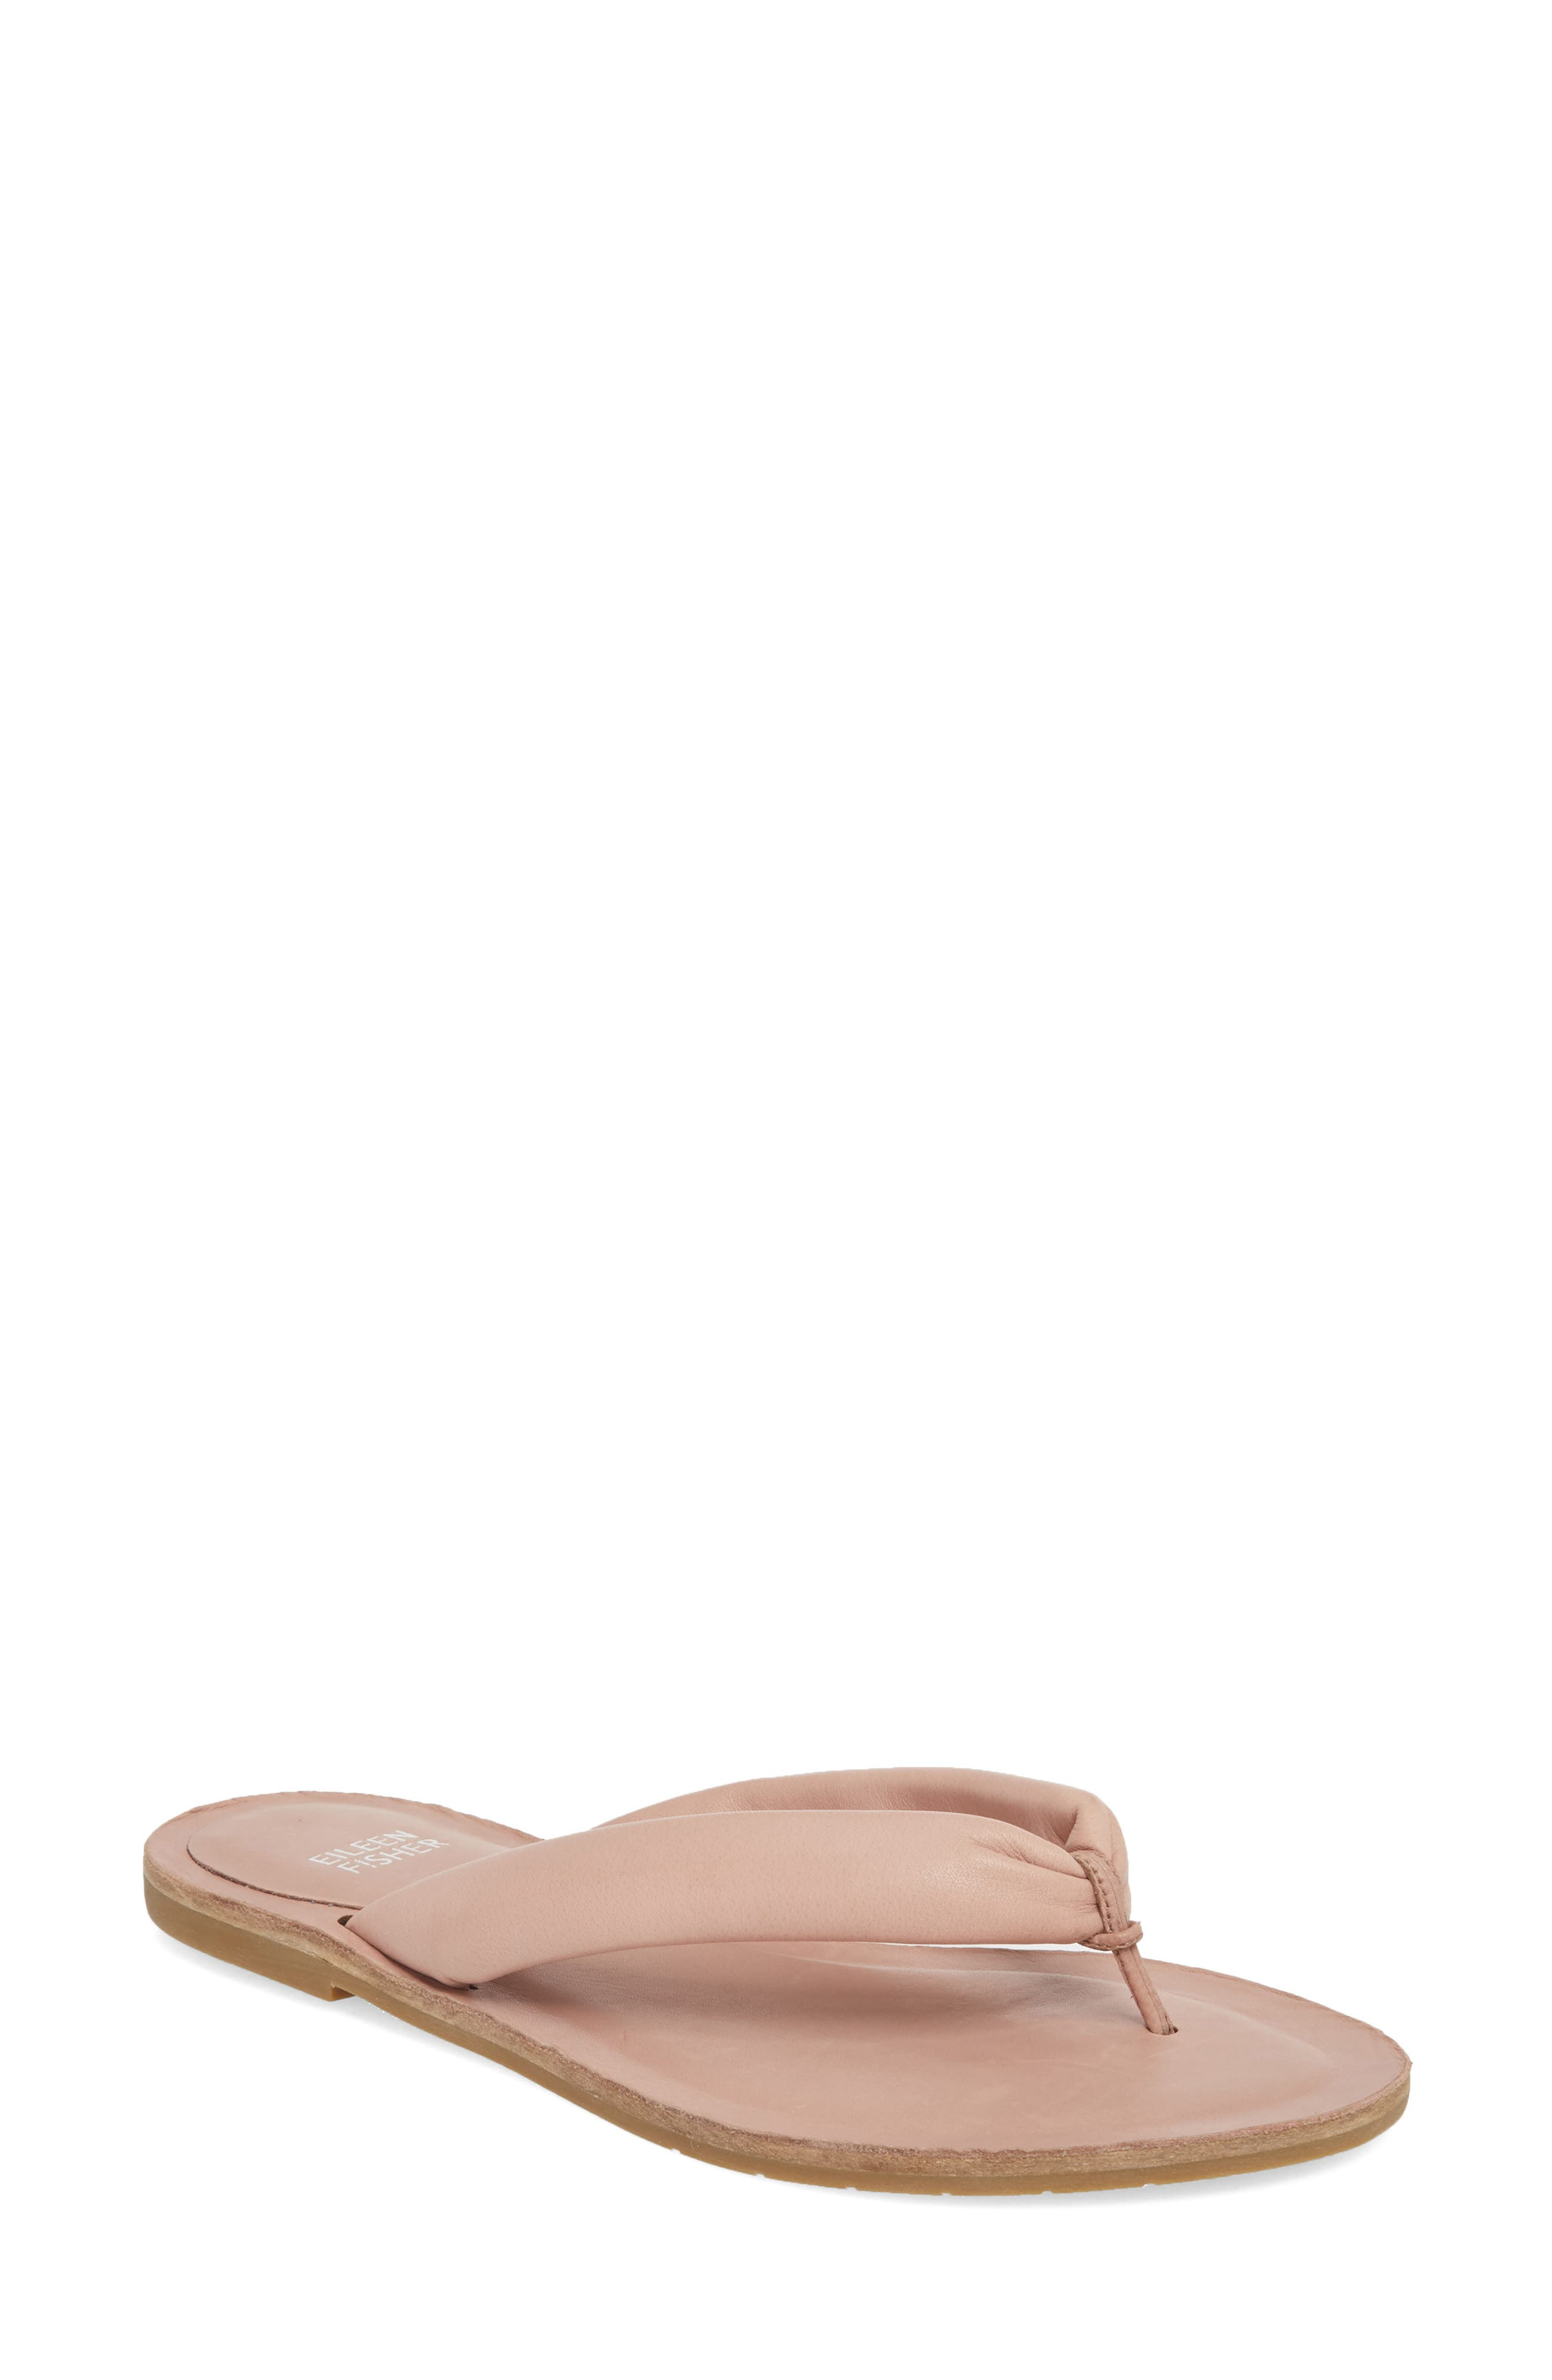 Flute Flip Flop,                         Main,                         color, Dusty Rose Leather